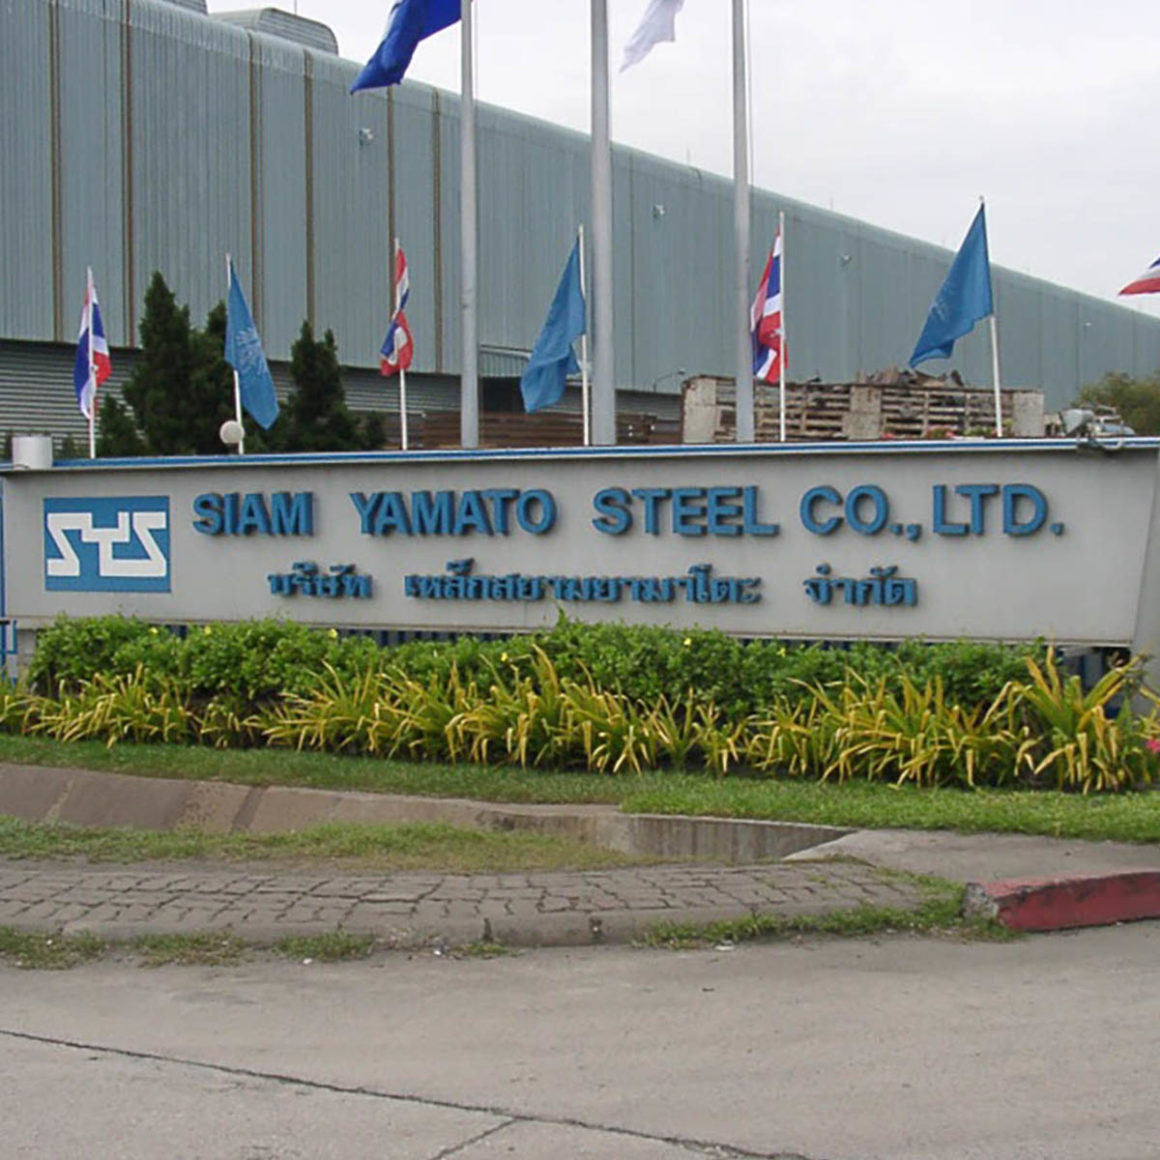 Steel Mill: H-beam Mill & New Mini Mill Projects of Siam Yamato Steel